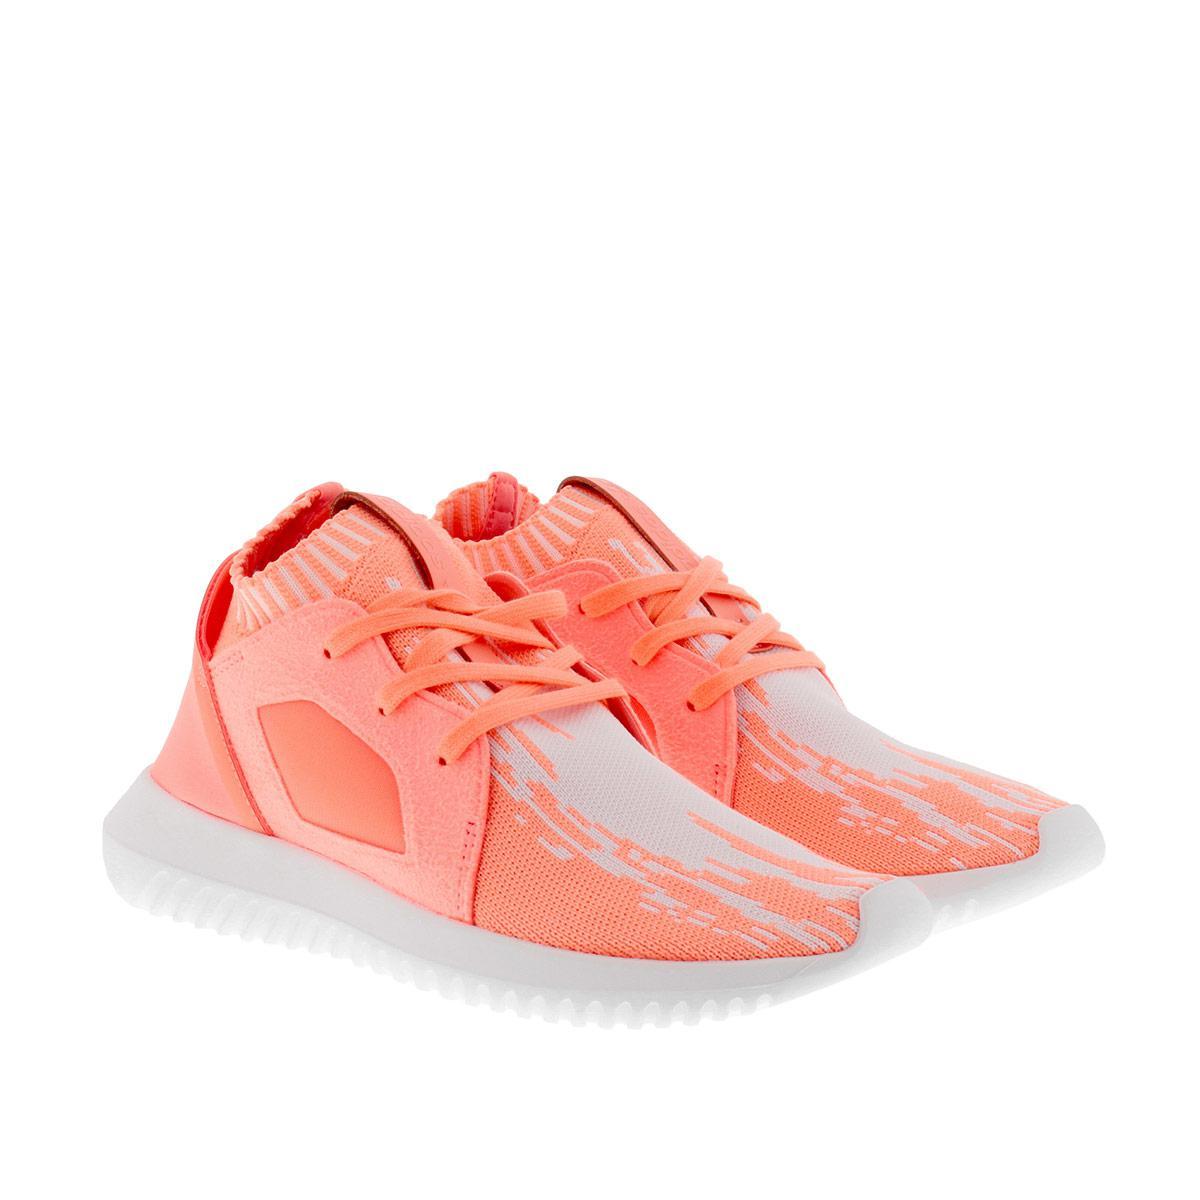 e82eb9637e55 Adidas Originals Tubular Defiant Primeknit W Sneaker Sun Glow ...